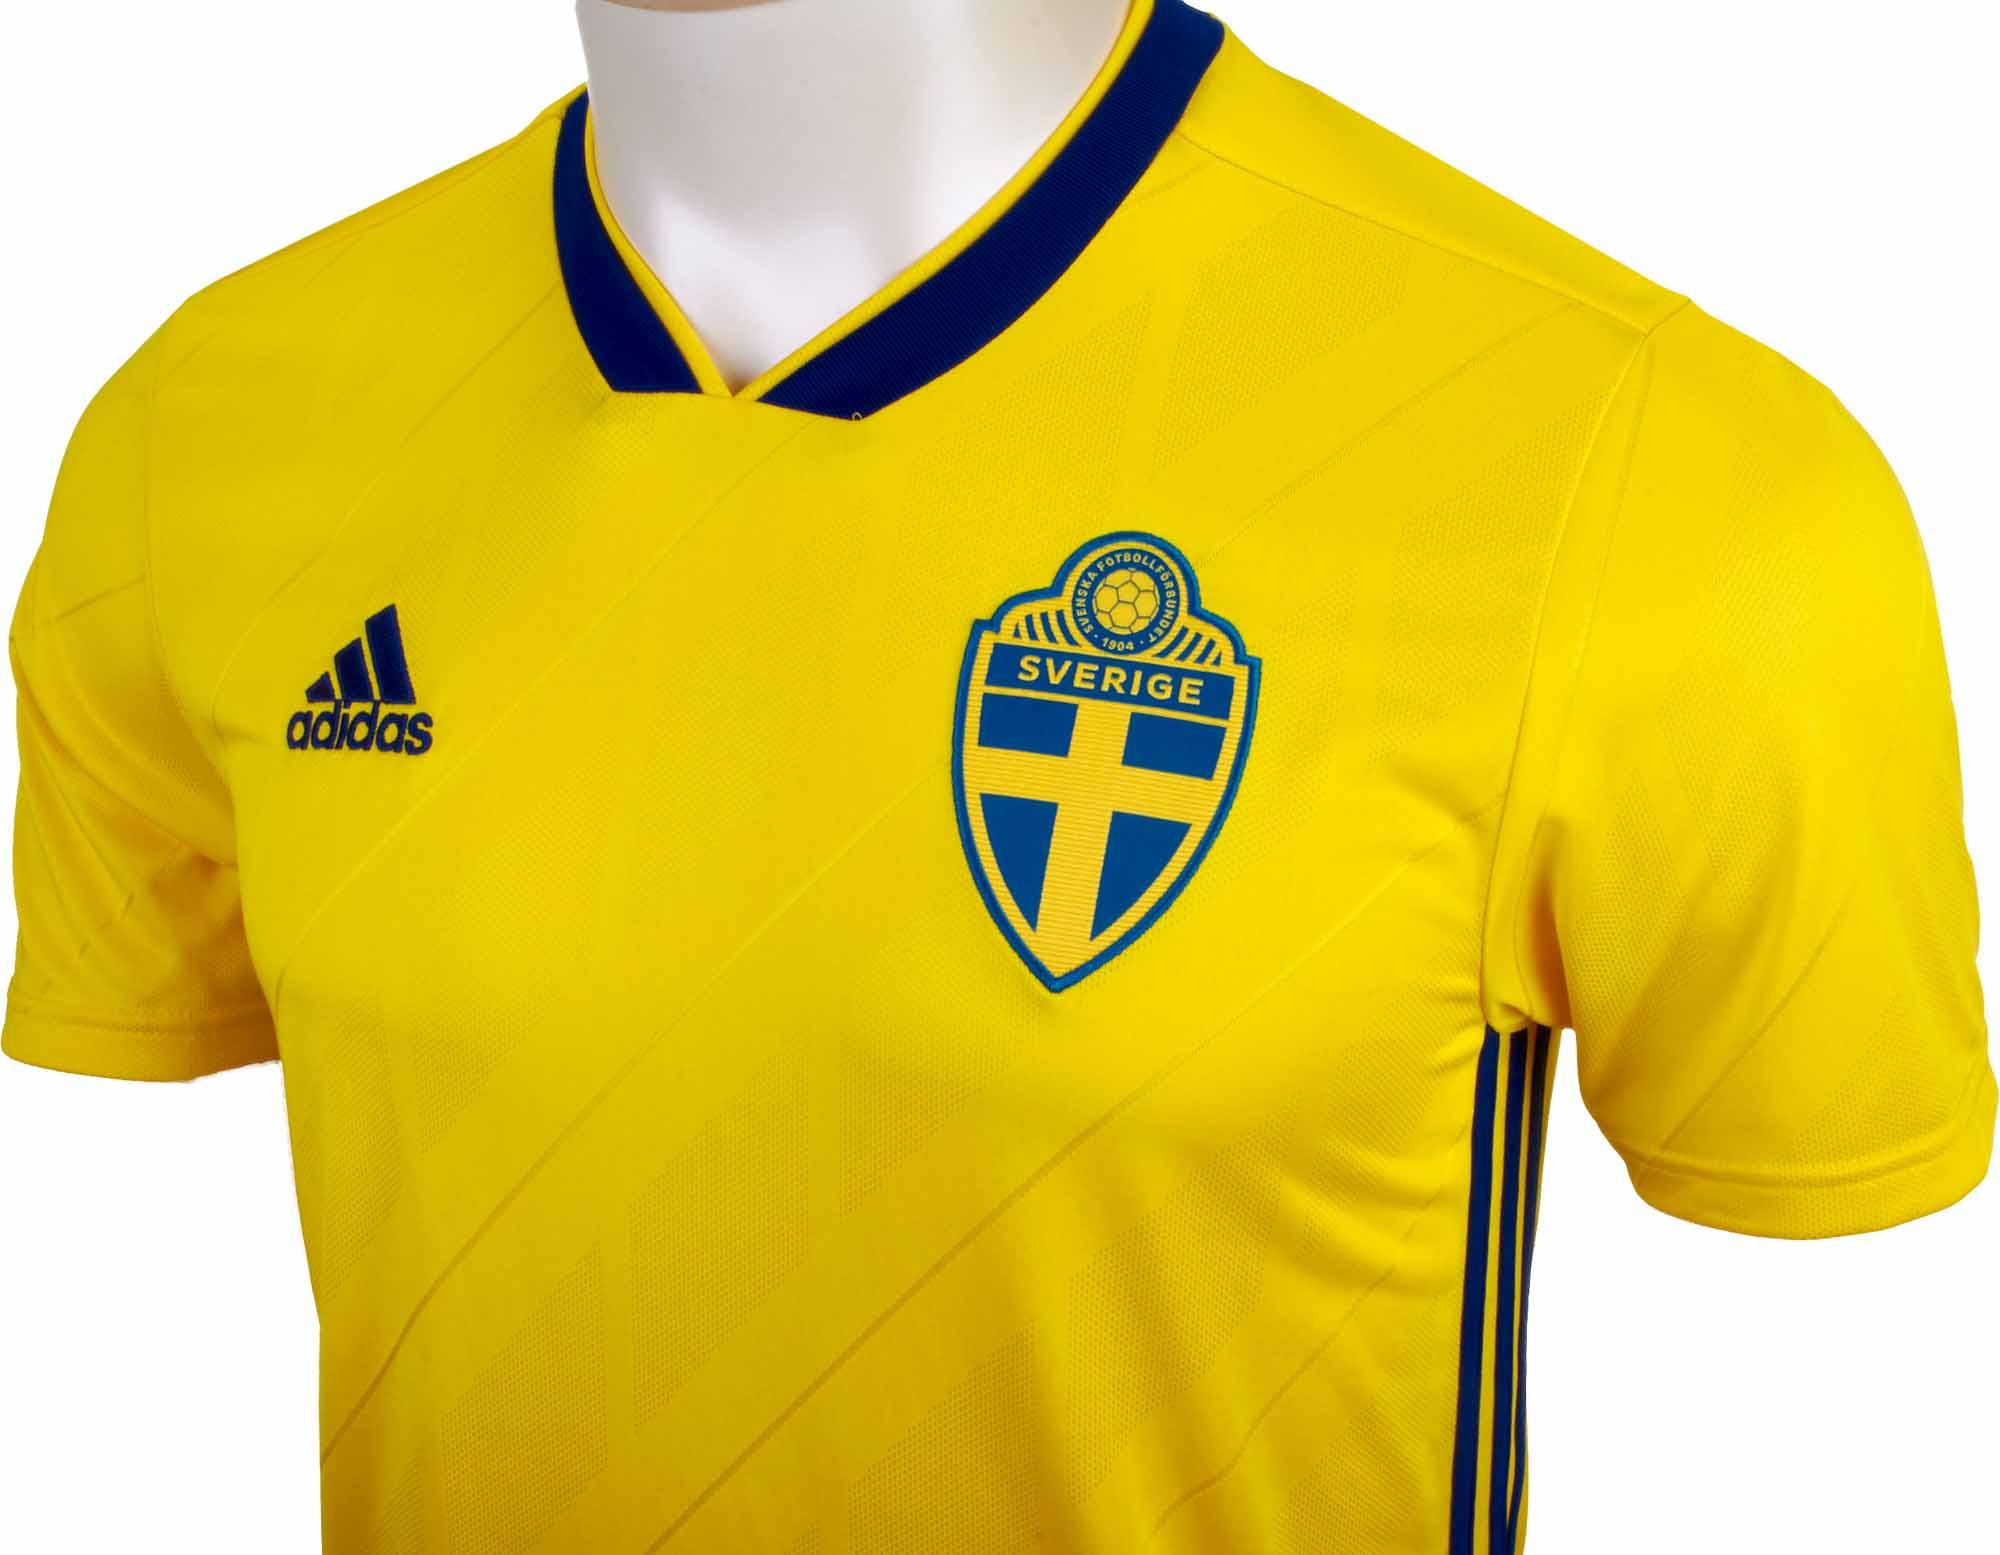 6440a2fe458 adidas Sweden Home Jersey 2018-19 - SoccerPro